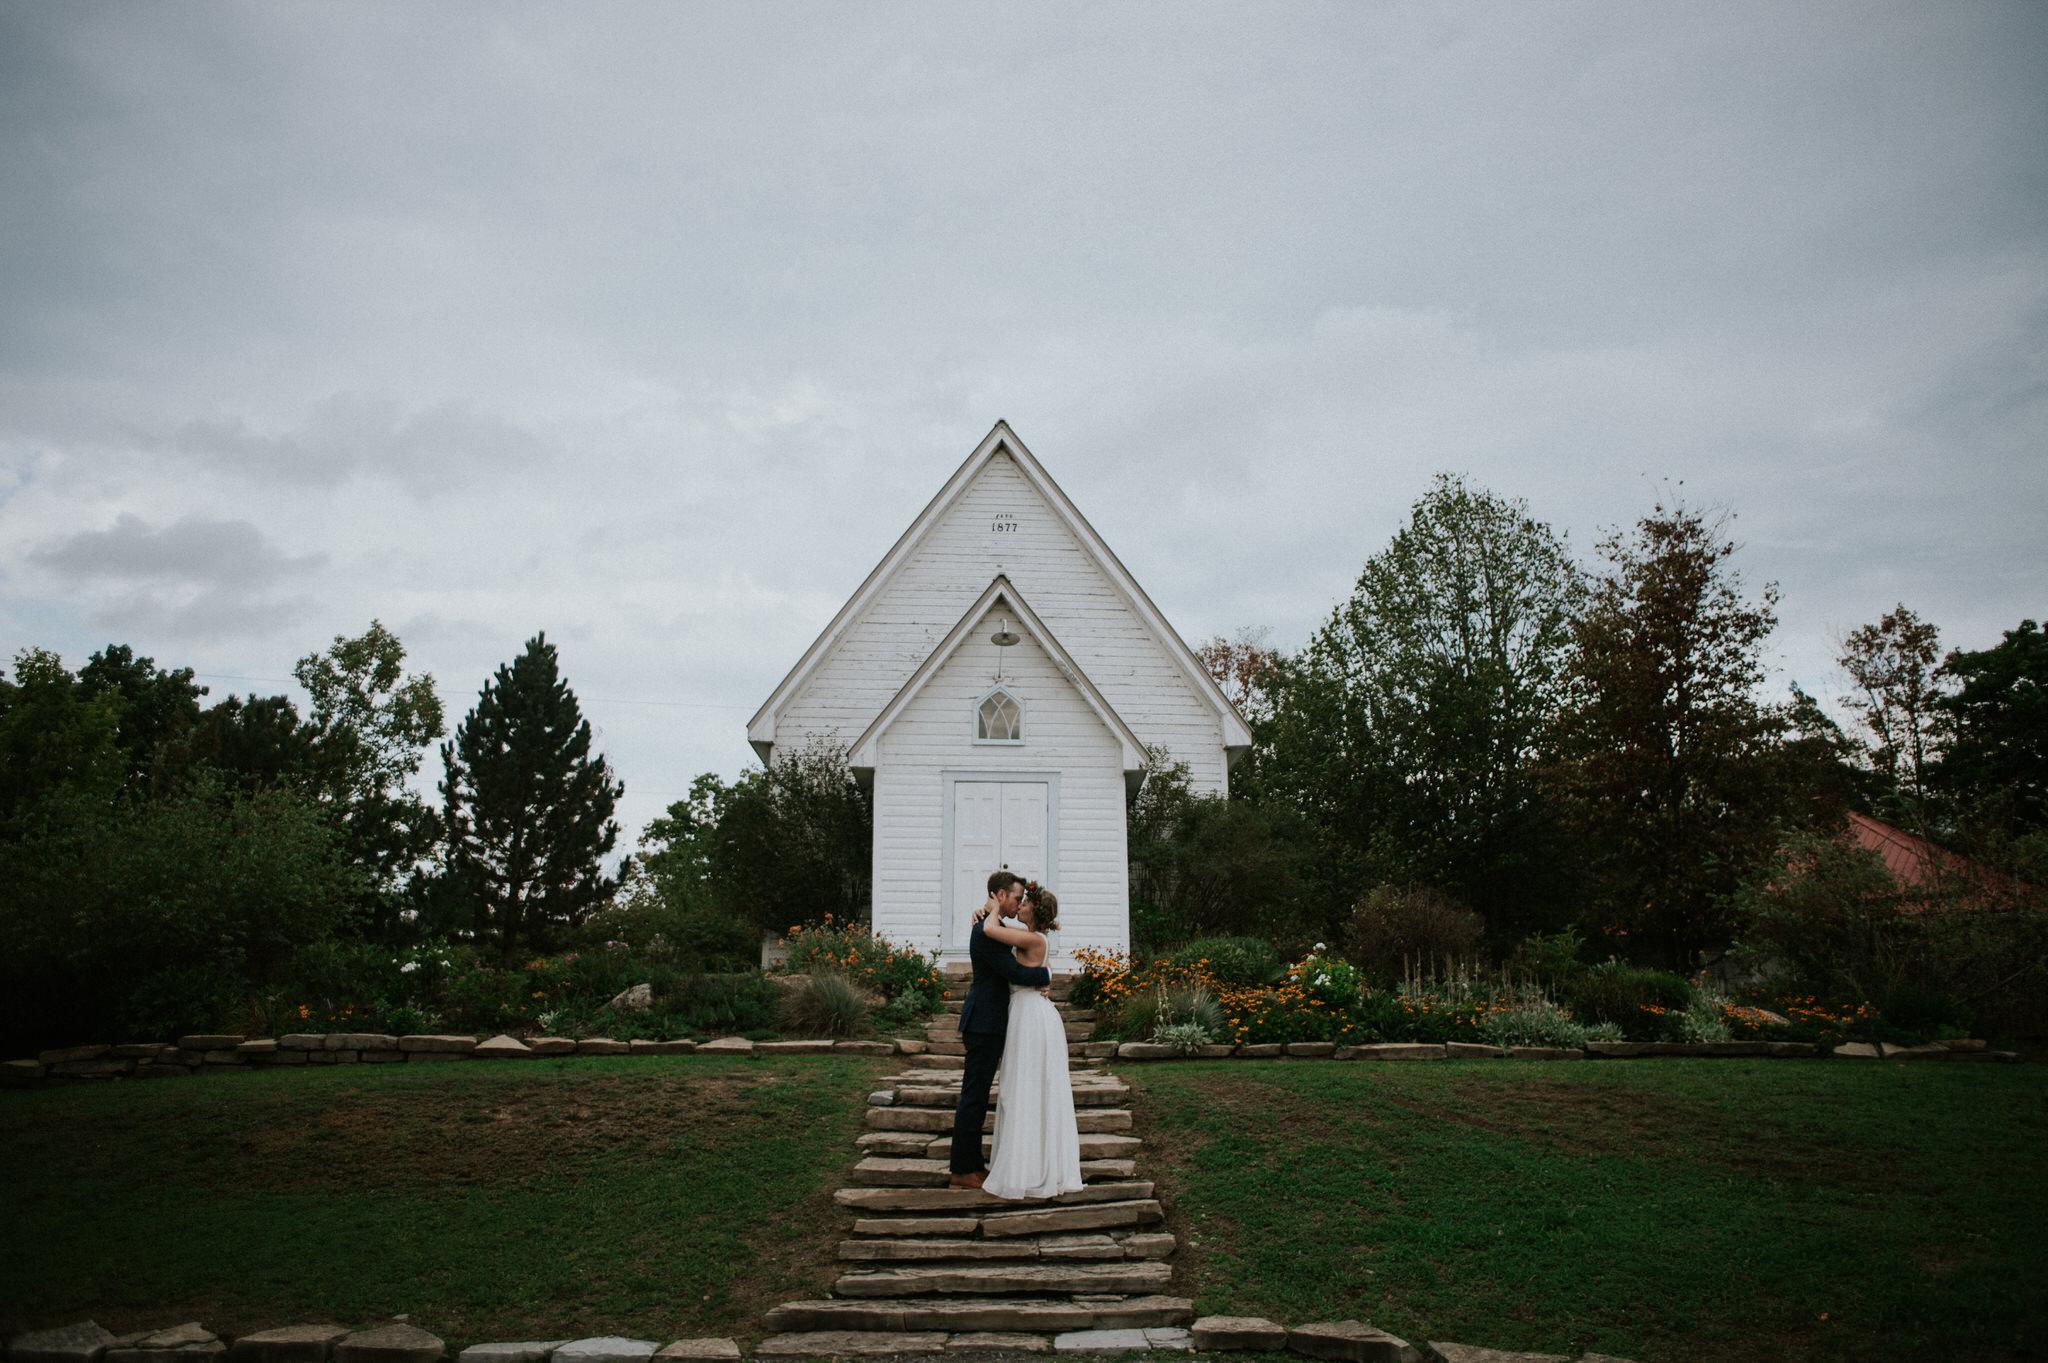 toronto wedding photography169.JPG